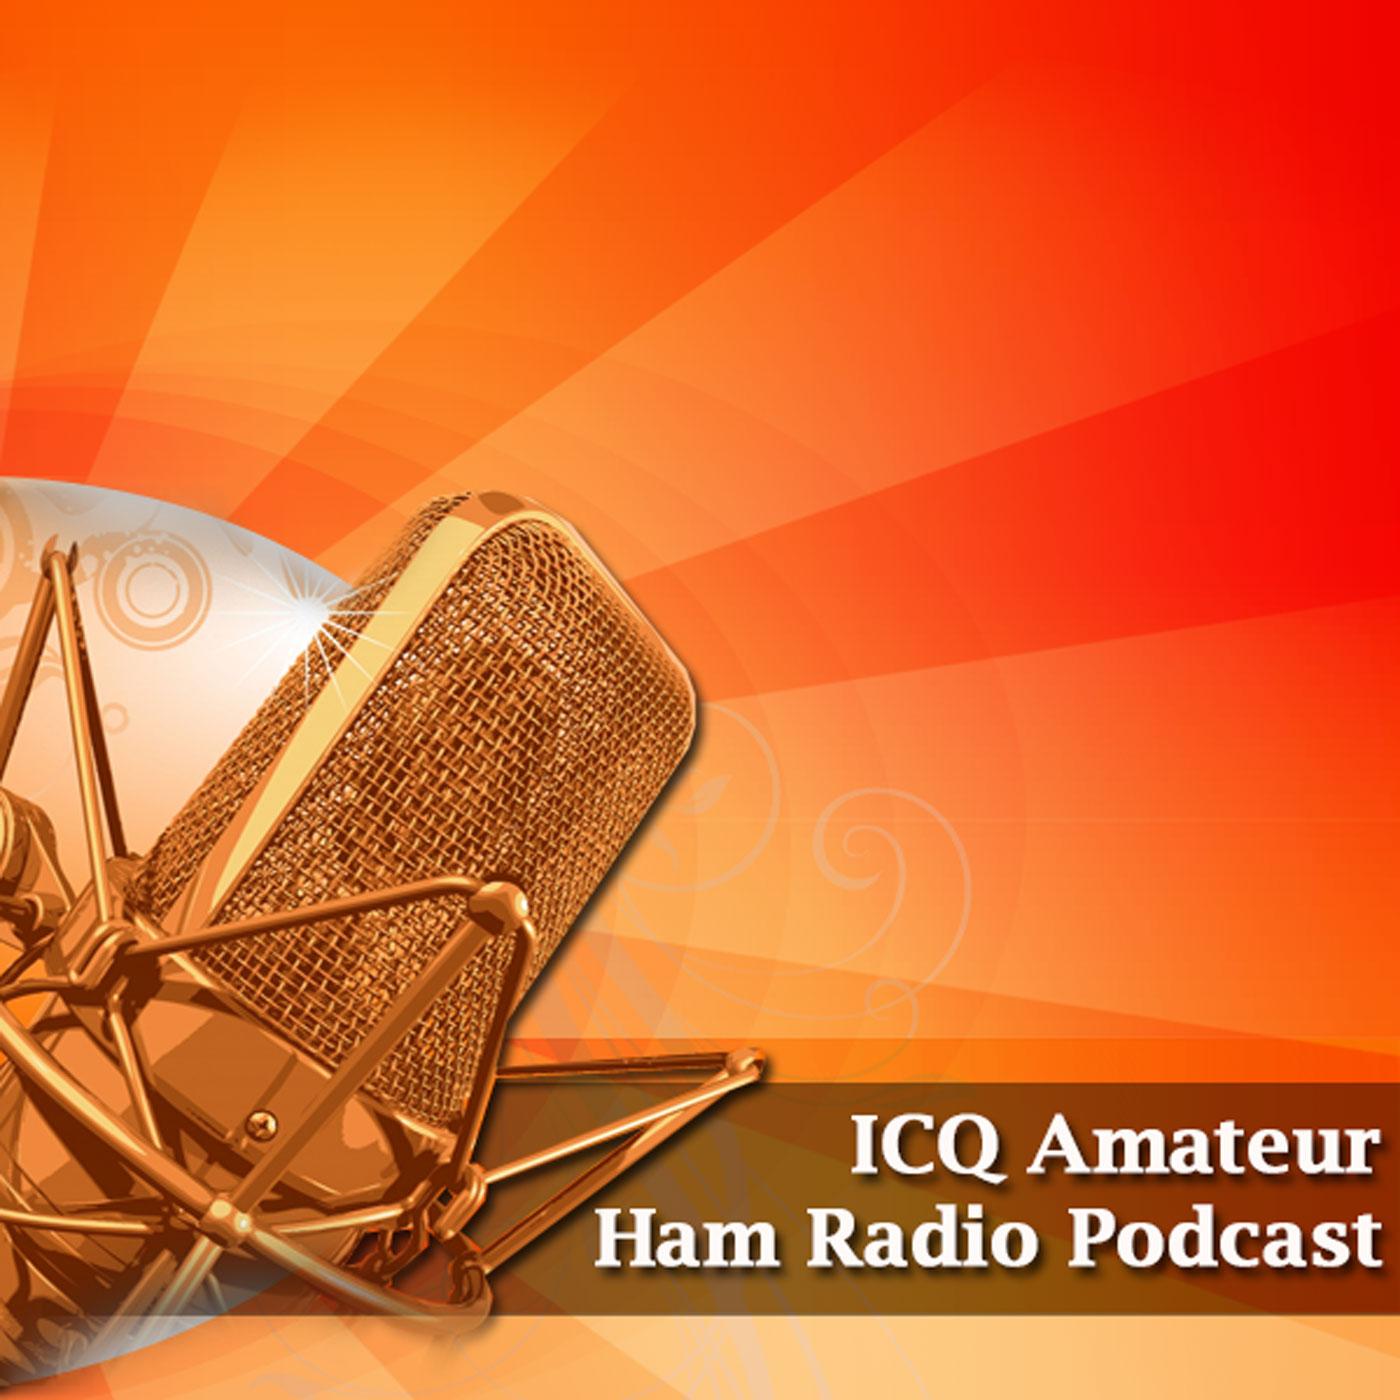 icqpodcast's Amateur / Ham Radio Podcast show art